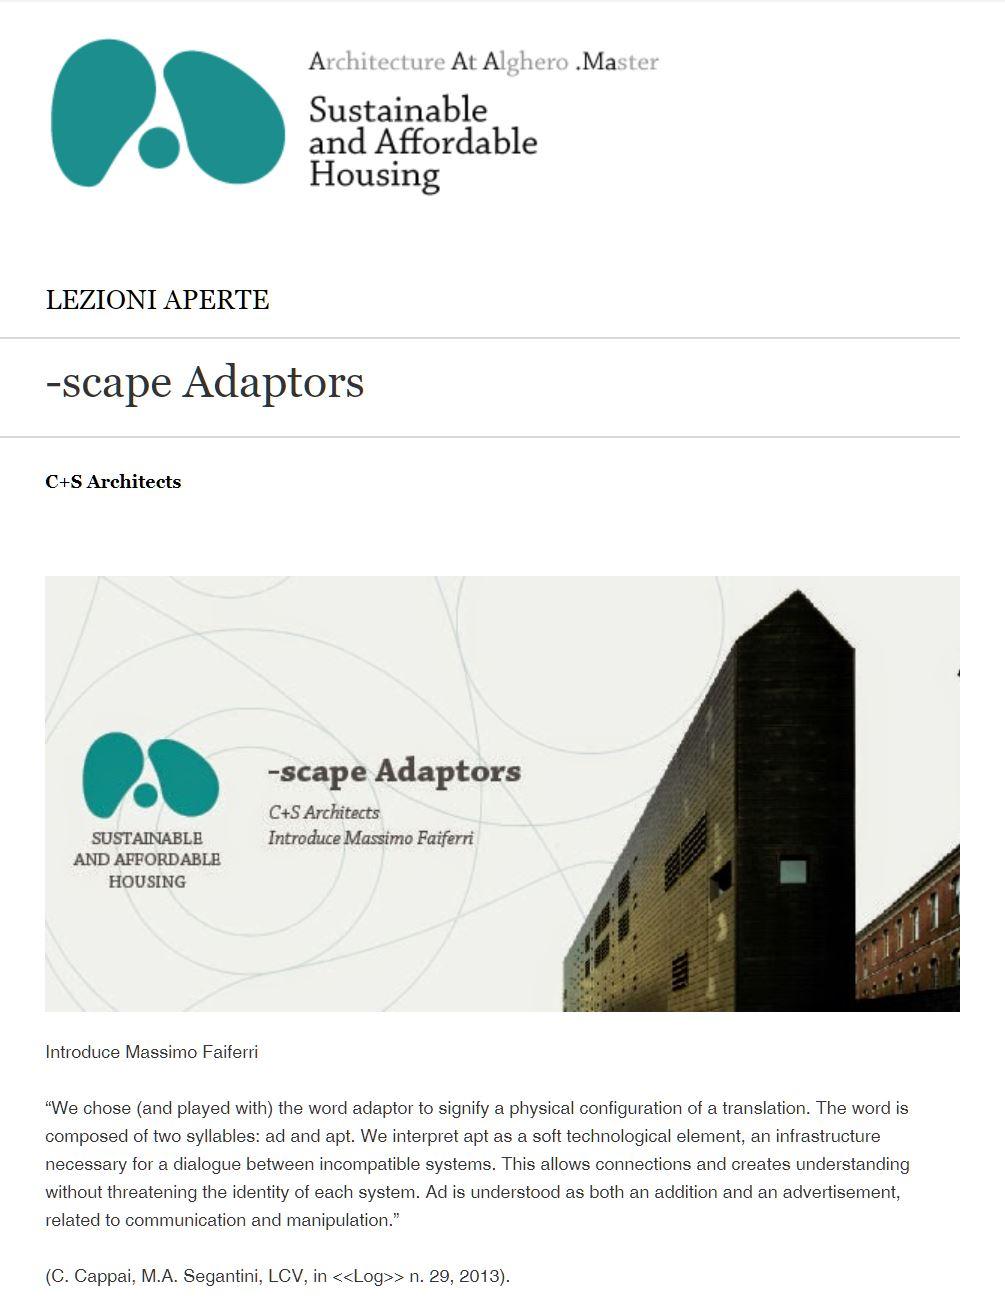 -scape Adaptors